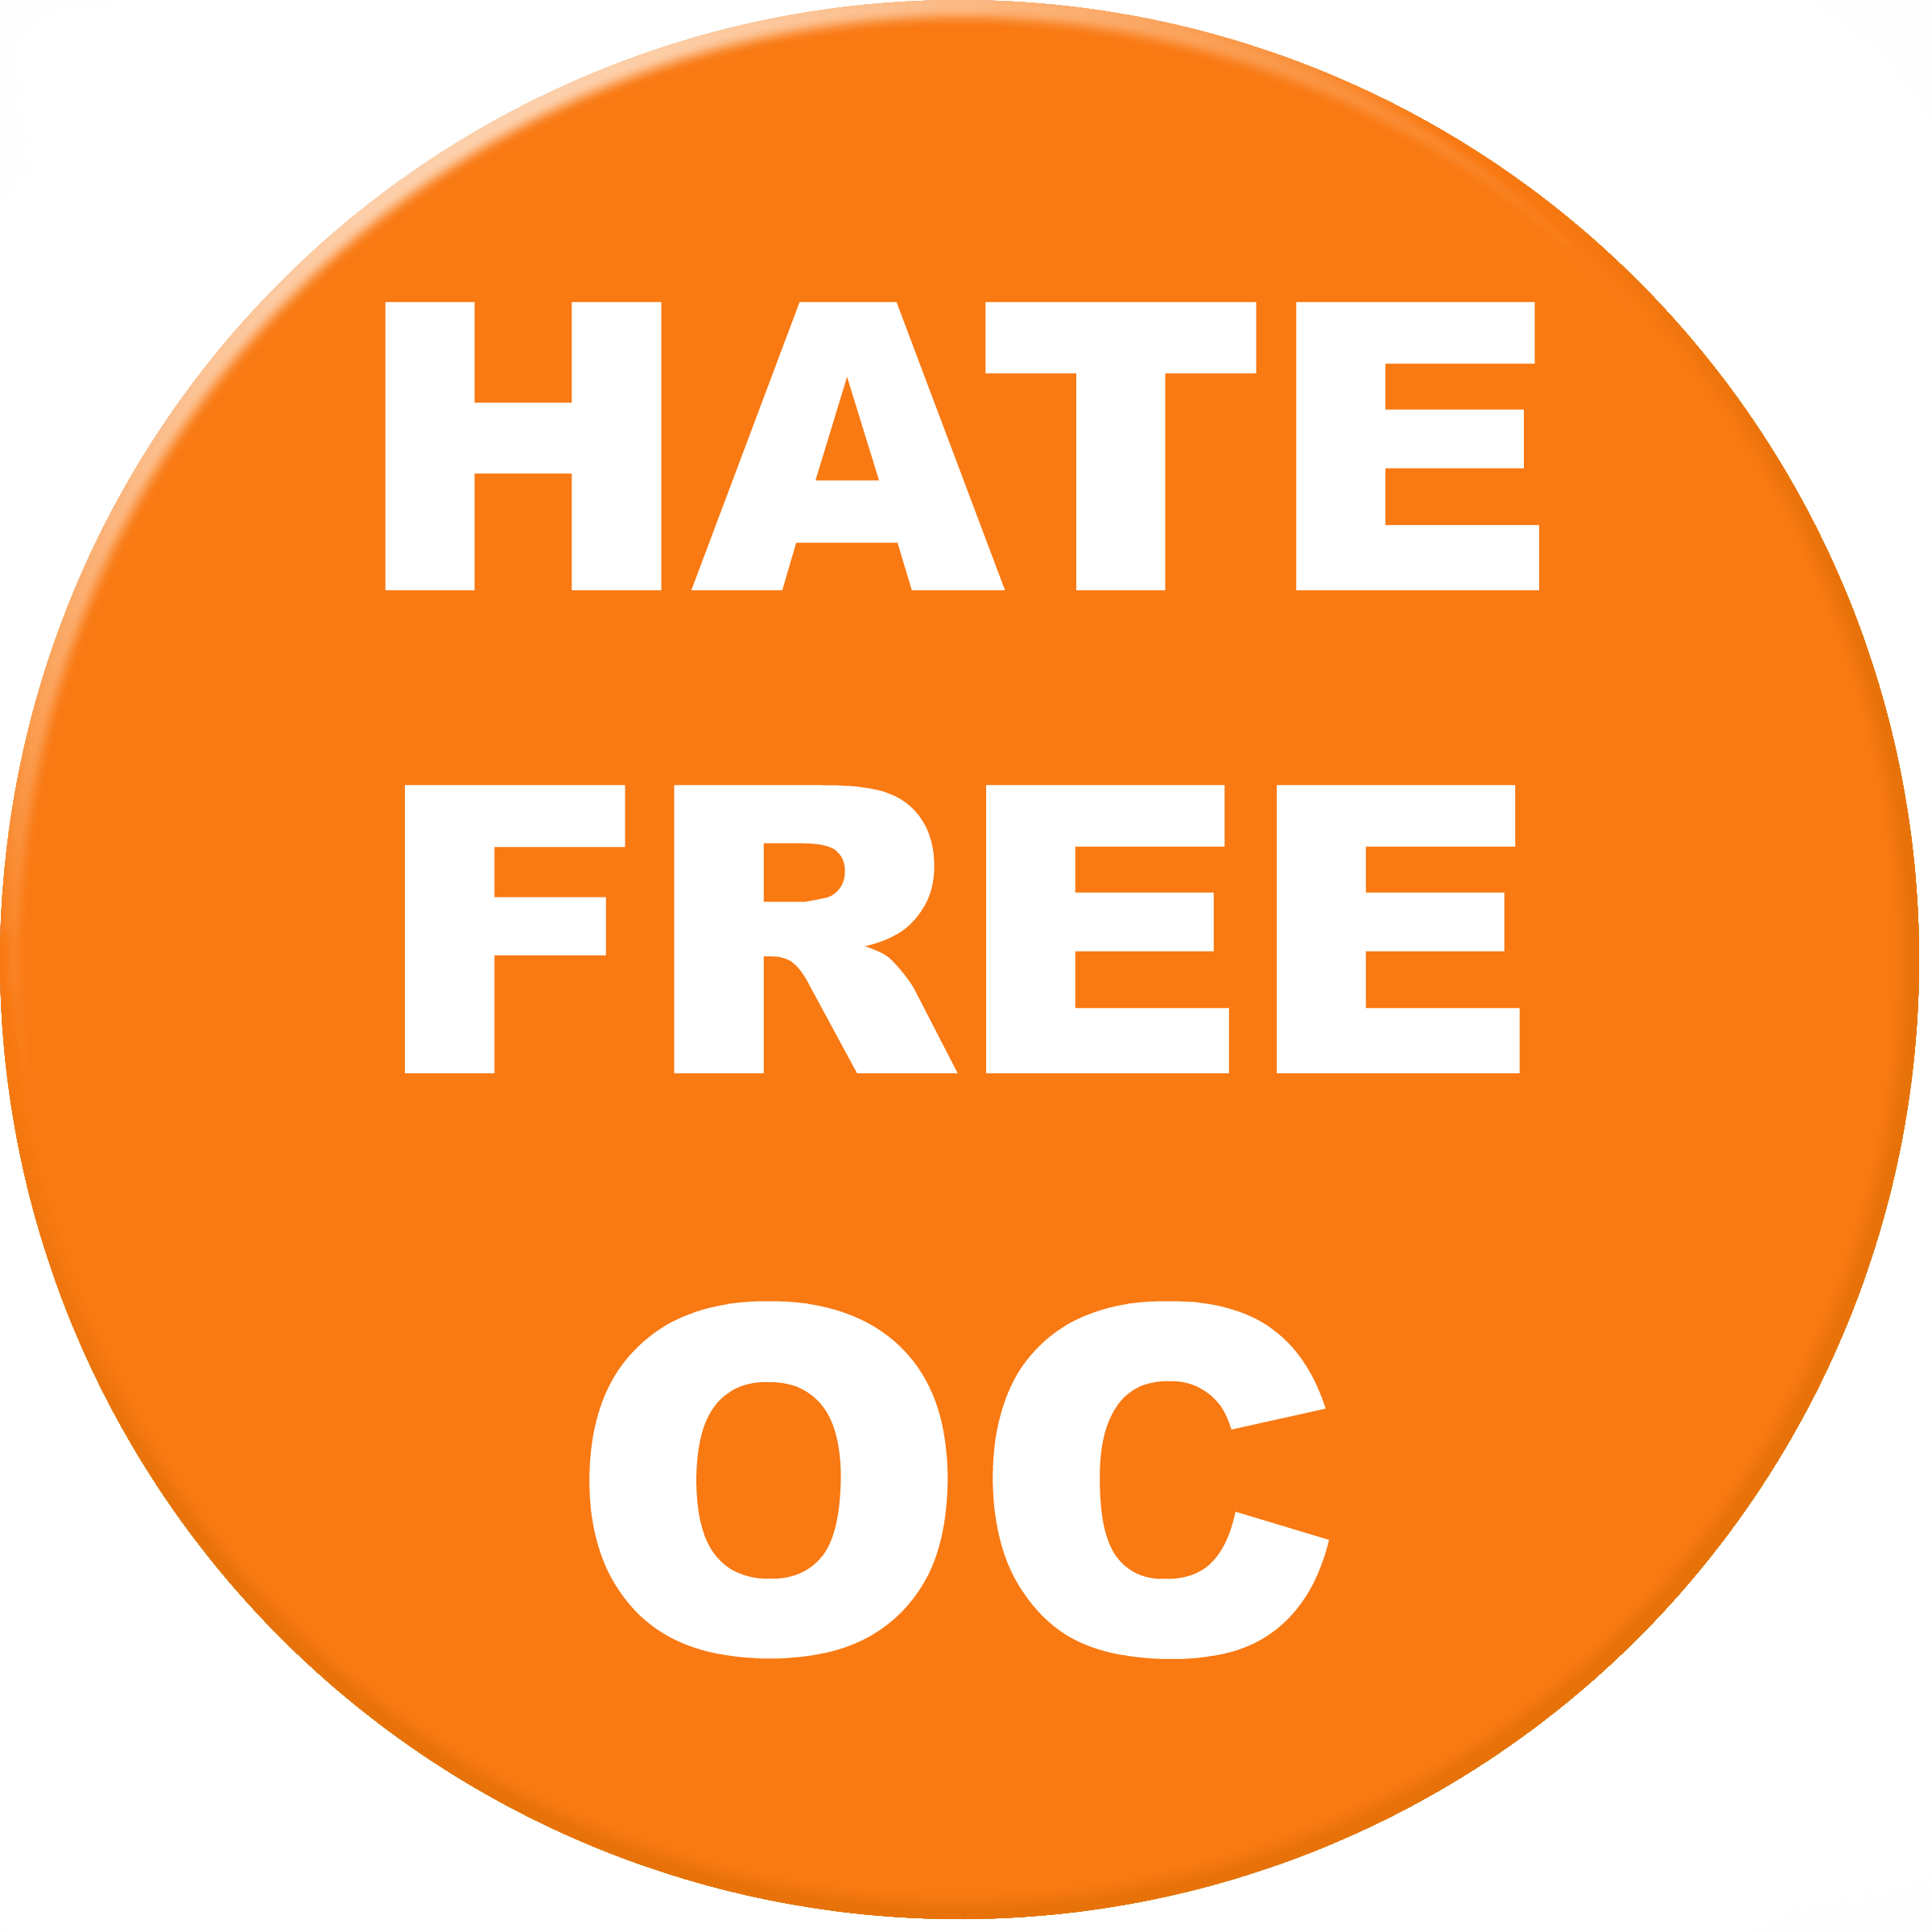 Rash of OC Hate Crimes Draws New Community Outreach for Hate Free OC